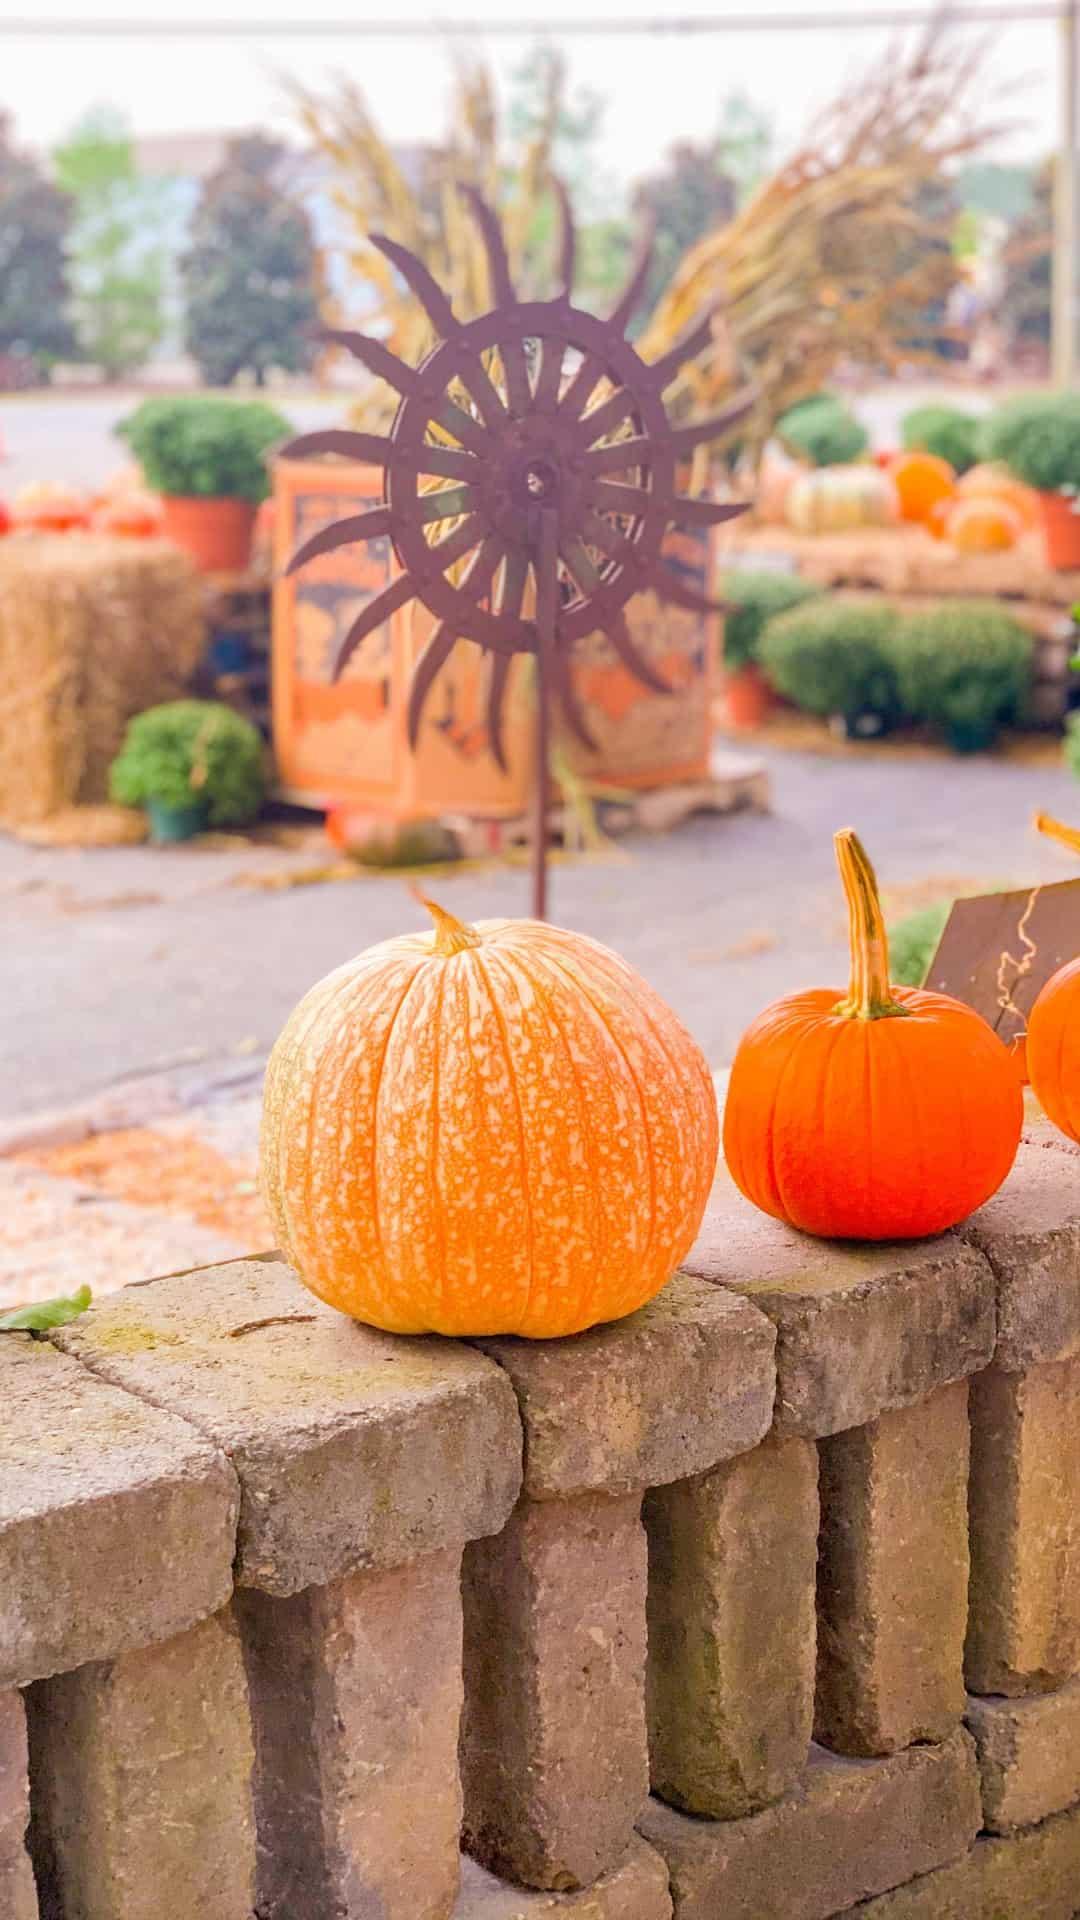 Autumn Wallpaper iPhone Aesthetic Fall On The Farm